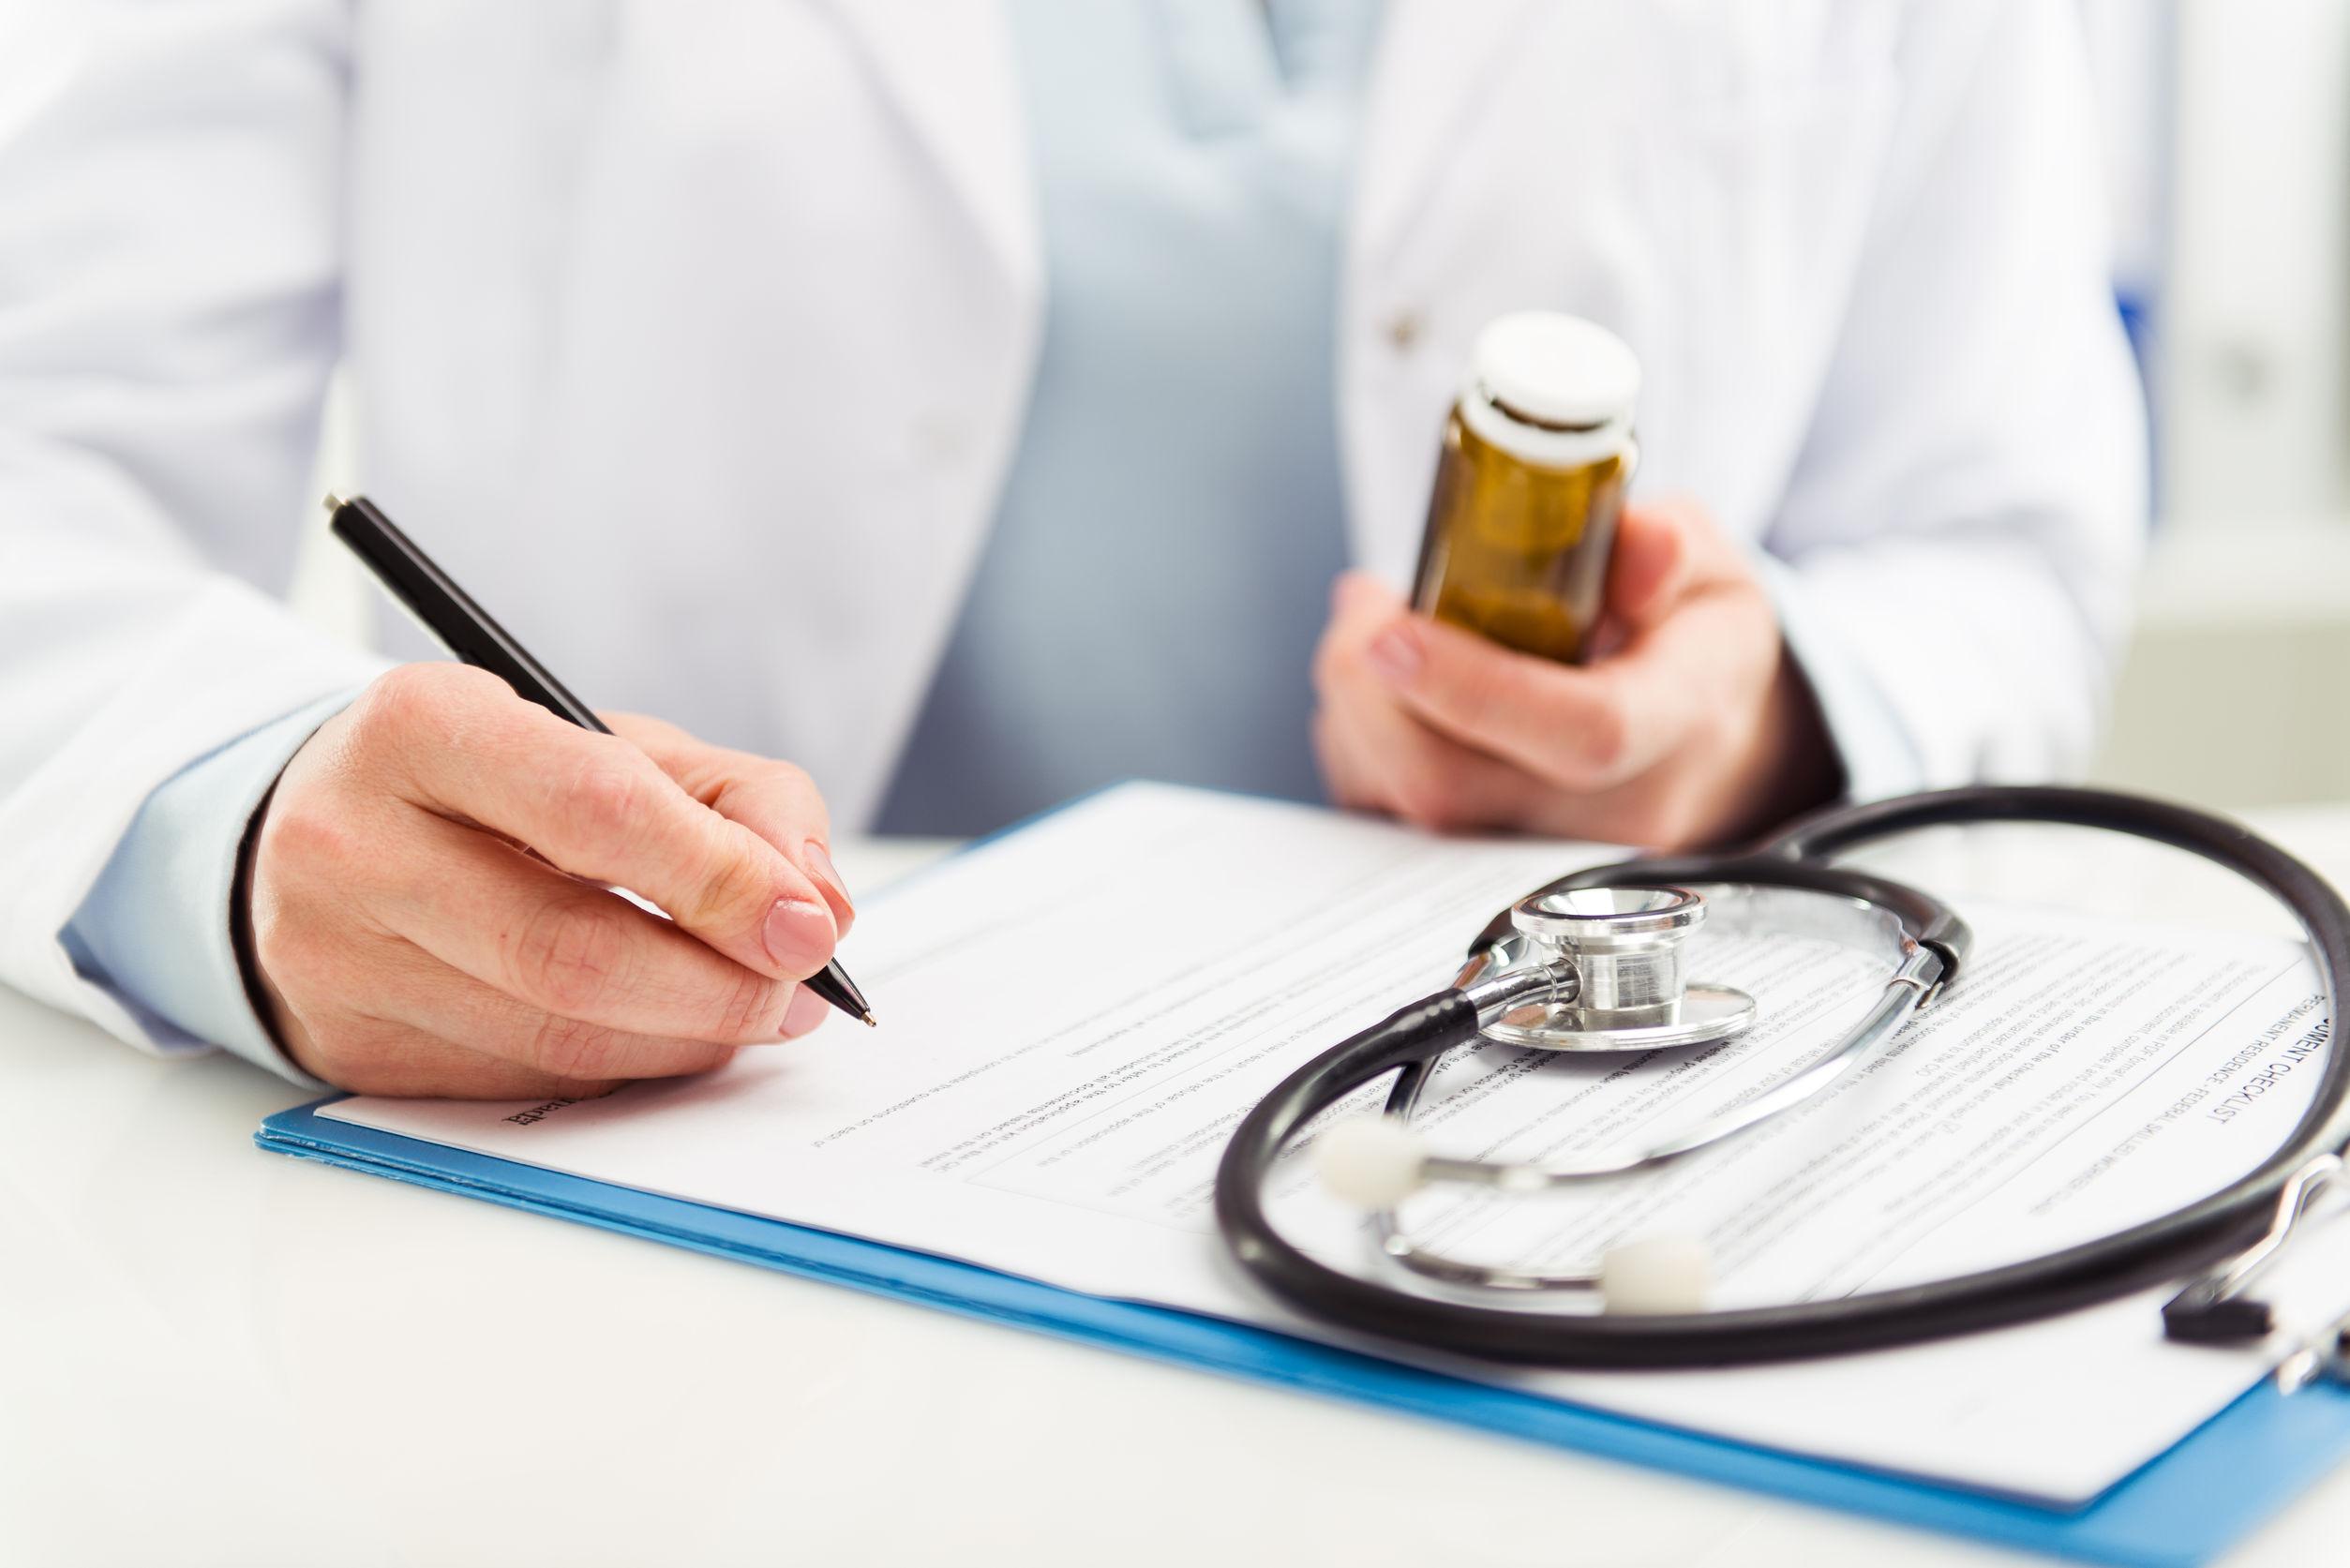 Doctor prescribing medications for patient